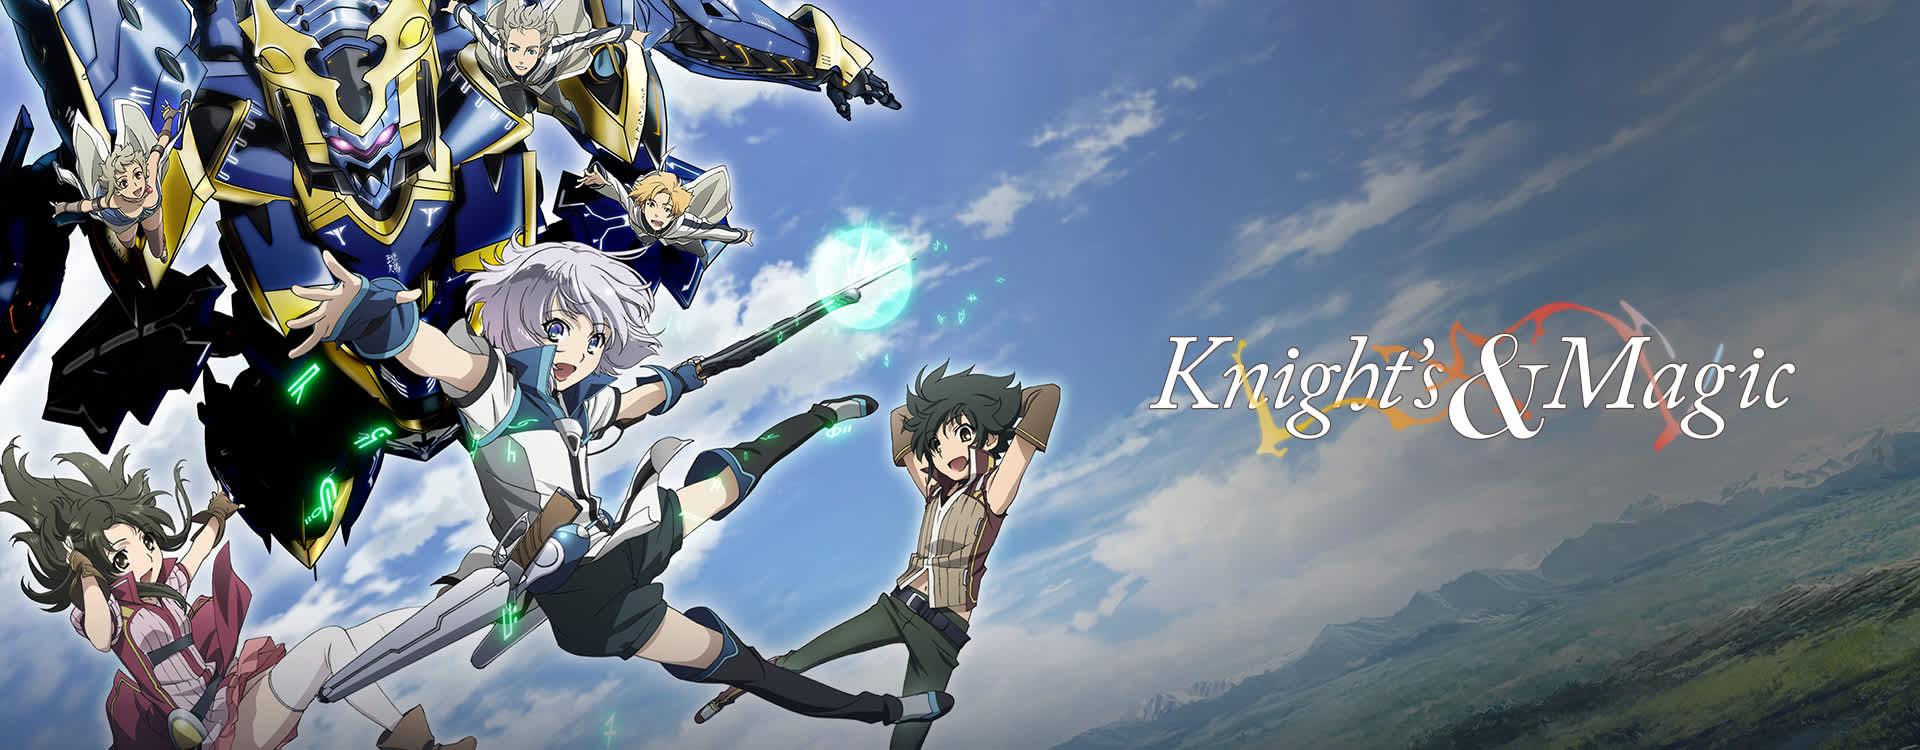 KnightS & Magic Ger Sub